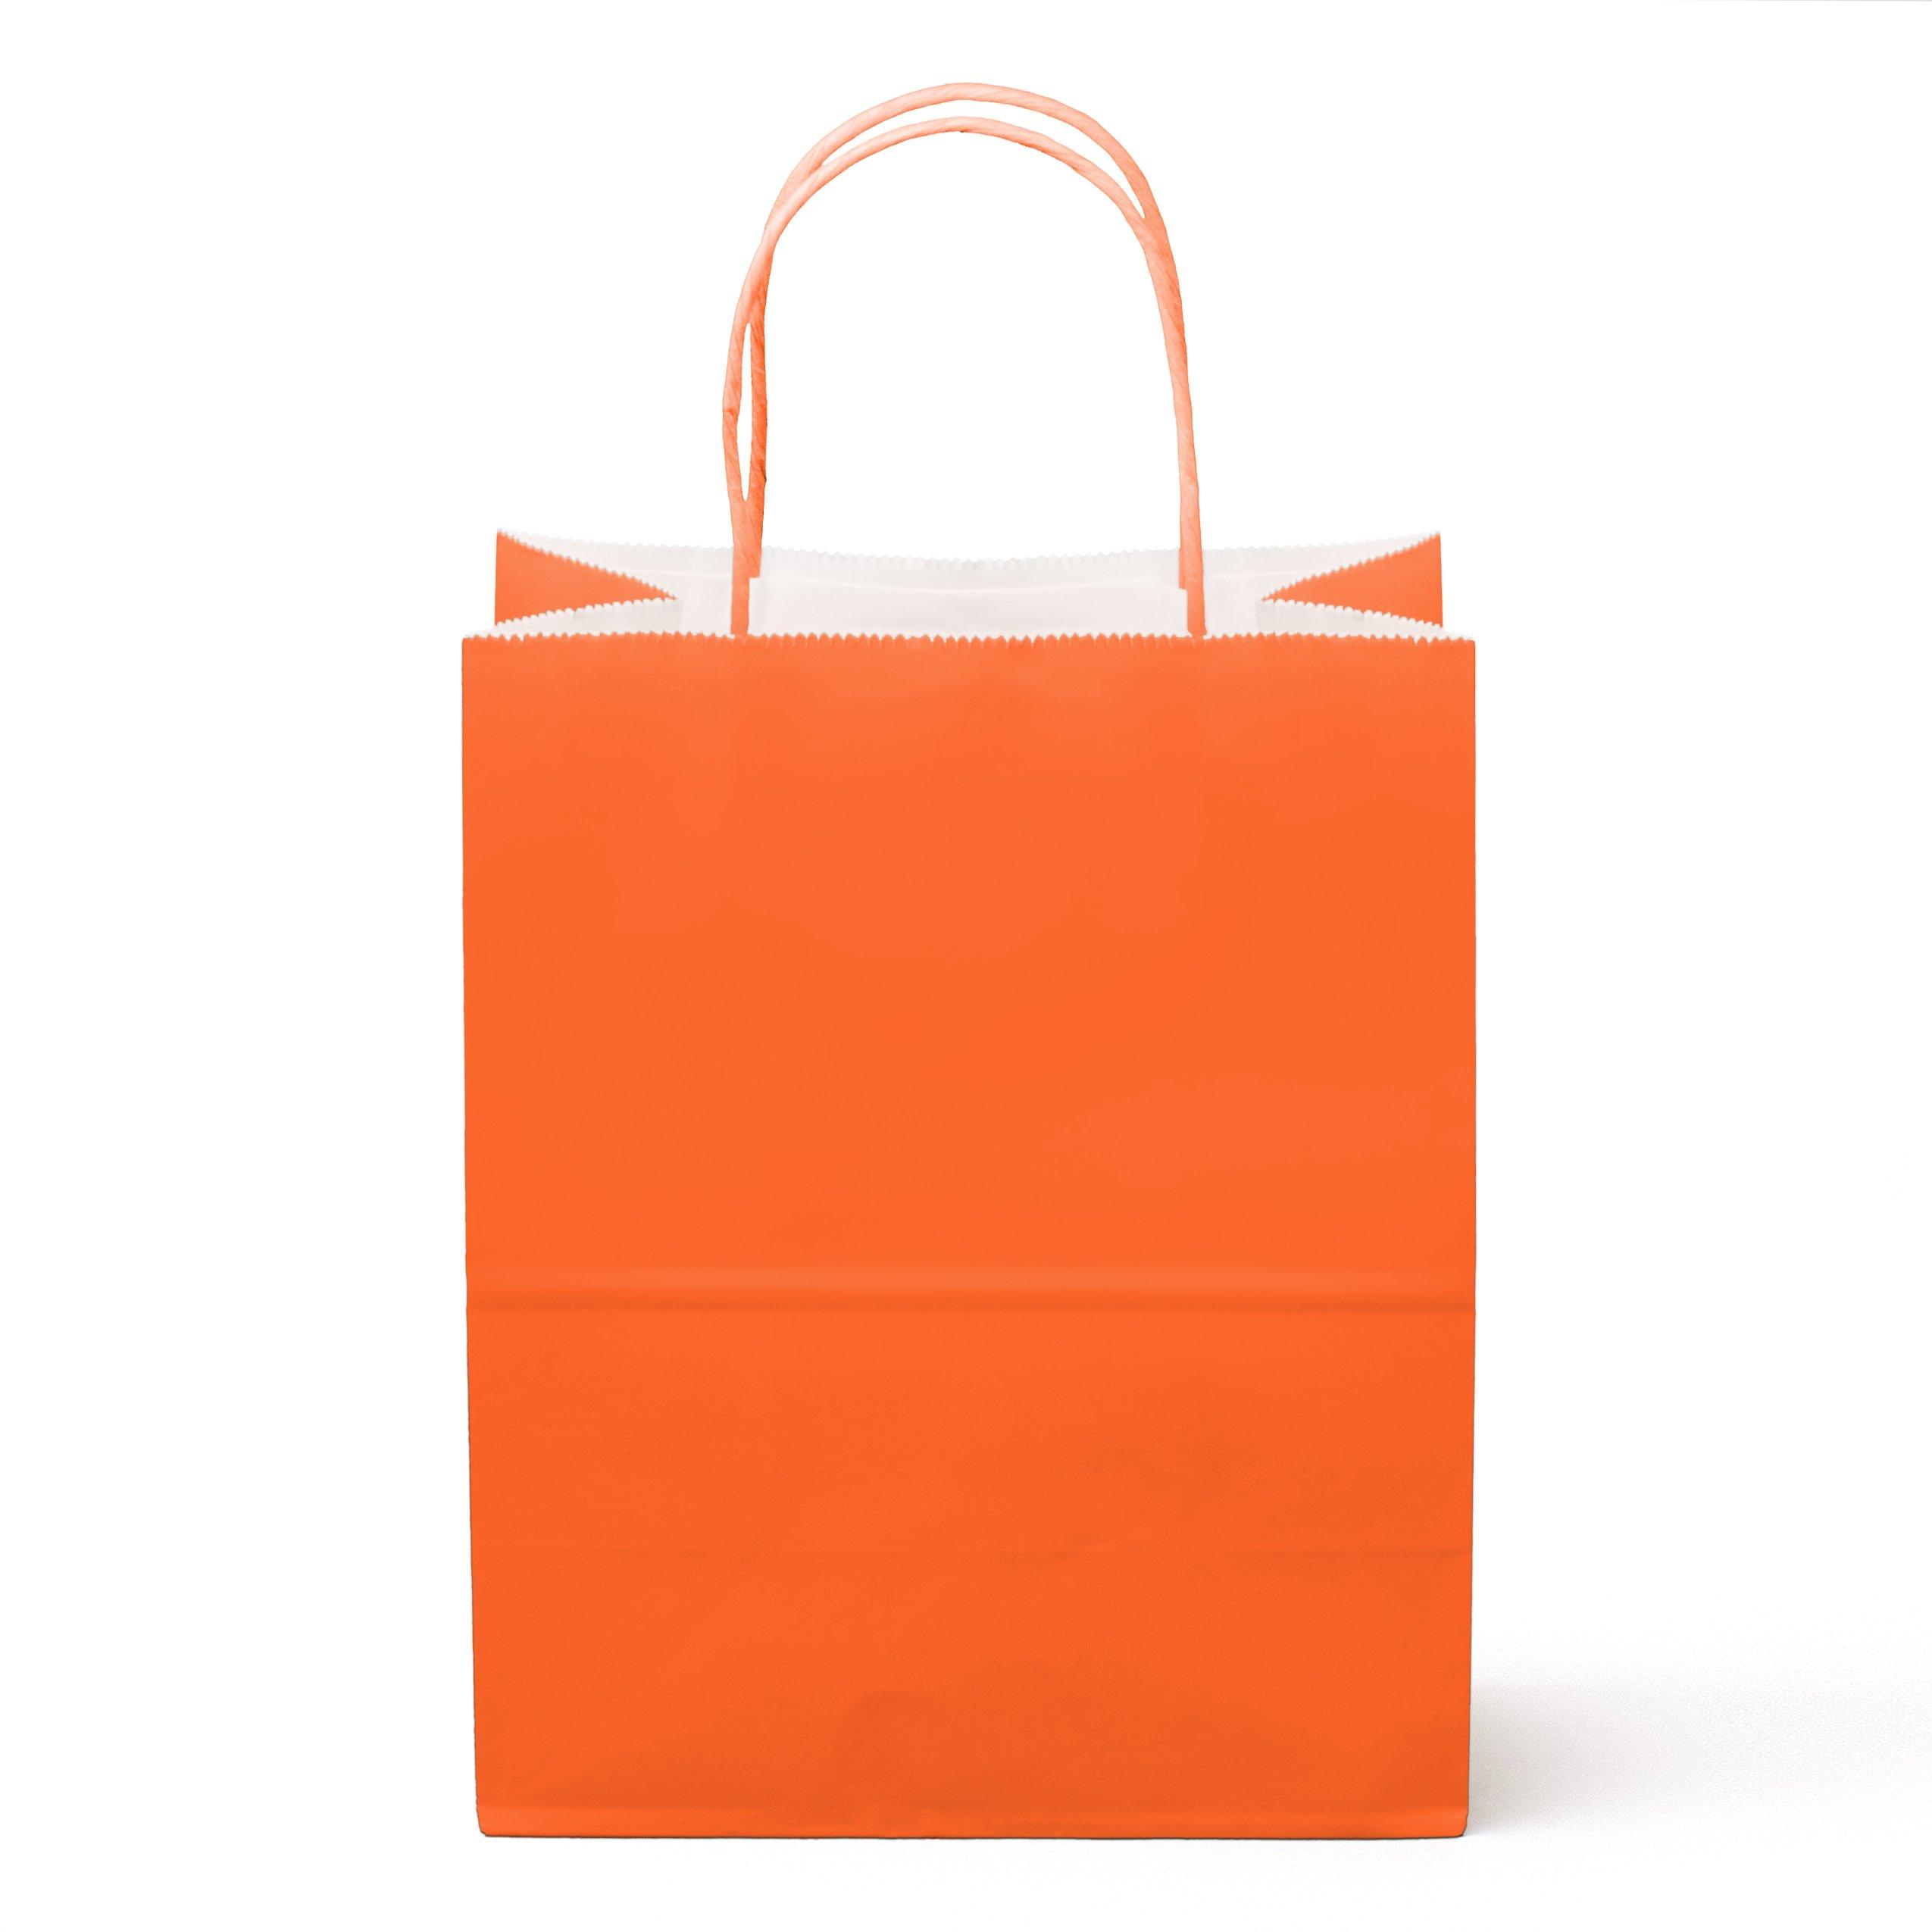 12CT Medium Orange, Food Safe Paper & Ink, Natural Premium Paper (Sturdy, Thicker, & Biodegradable), Vivid Colored Paper Gift Goody Kraft Bag with Colored Sturdy Handle (Medium, Orange)